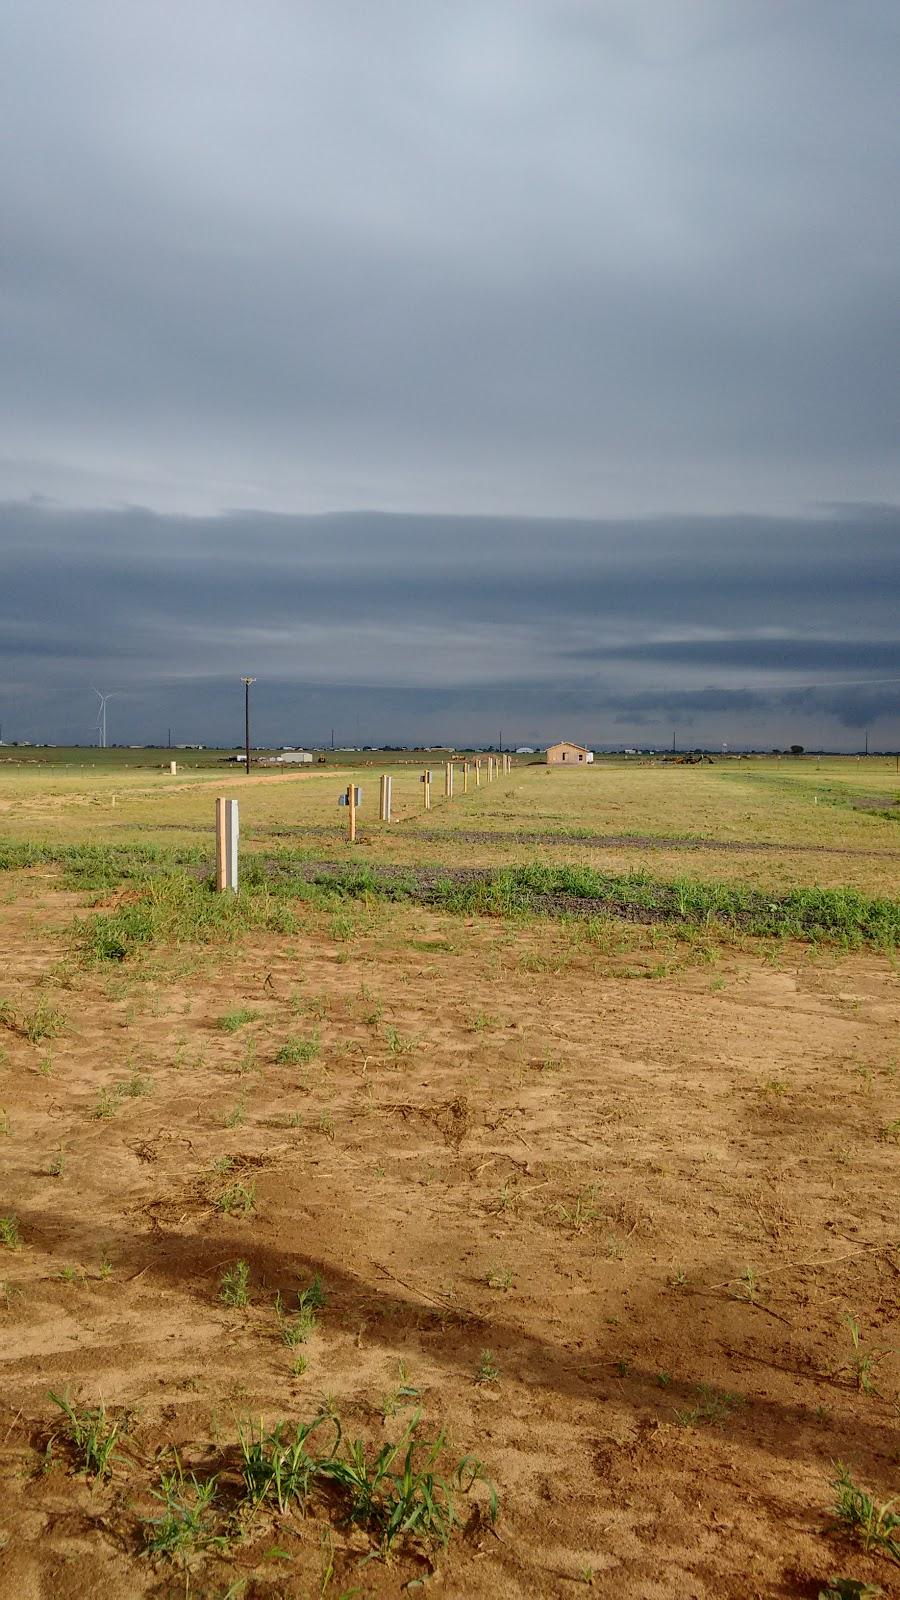 Loop 88 RV Park - rv park  | Photo 1 of 2 | Address: 9902 County Rd 6900, Lubbock, TX 79407, USA | Phone: (806) 549-8493